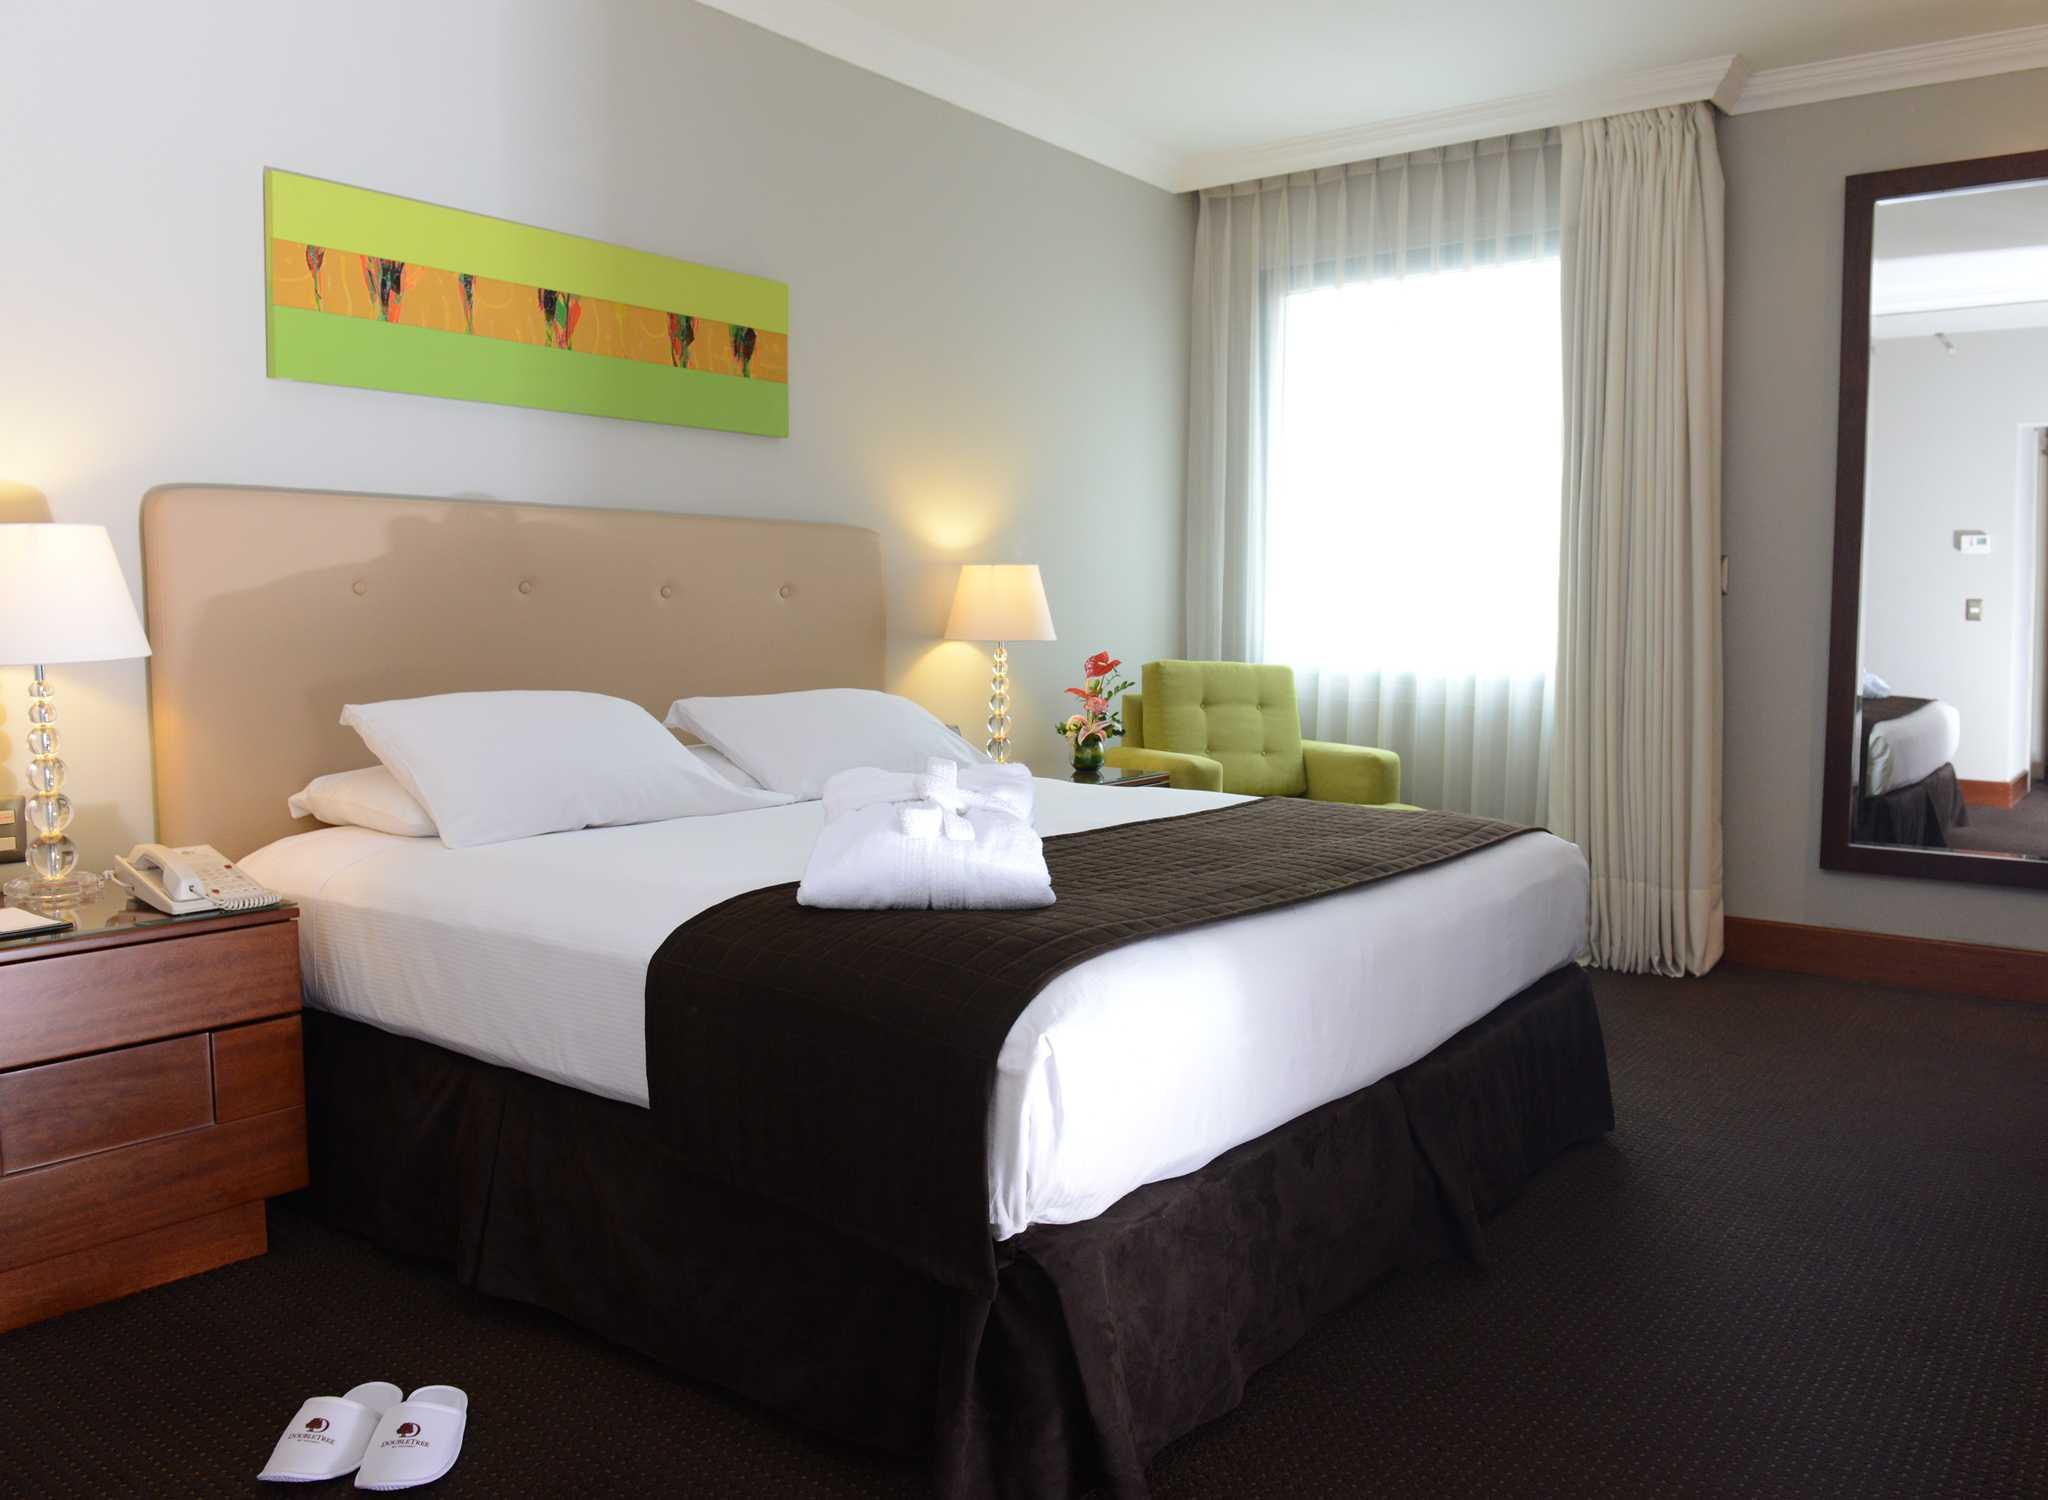 Lima Bedroom Furniture Lima Hotels El Pardo Doubletree By Hilton In Lima Peru